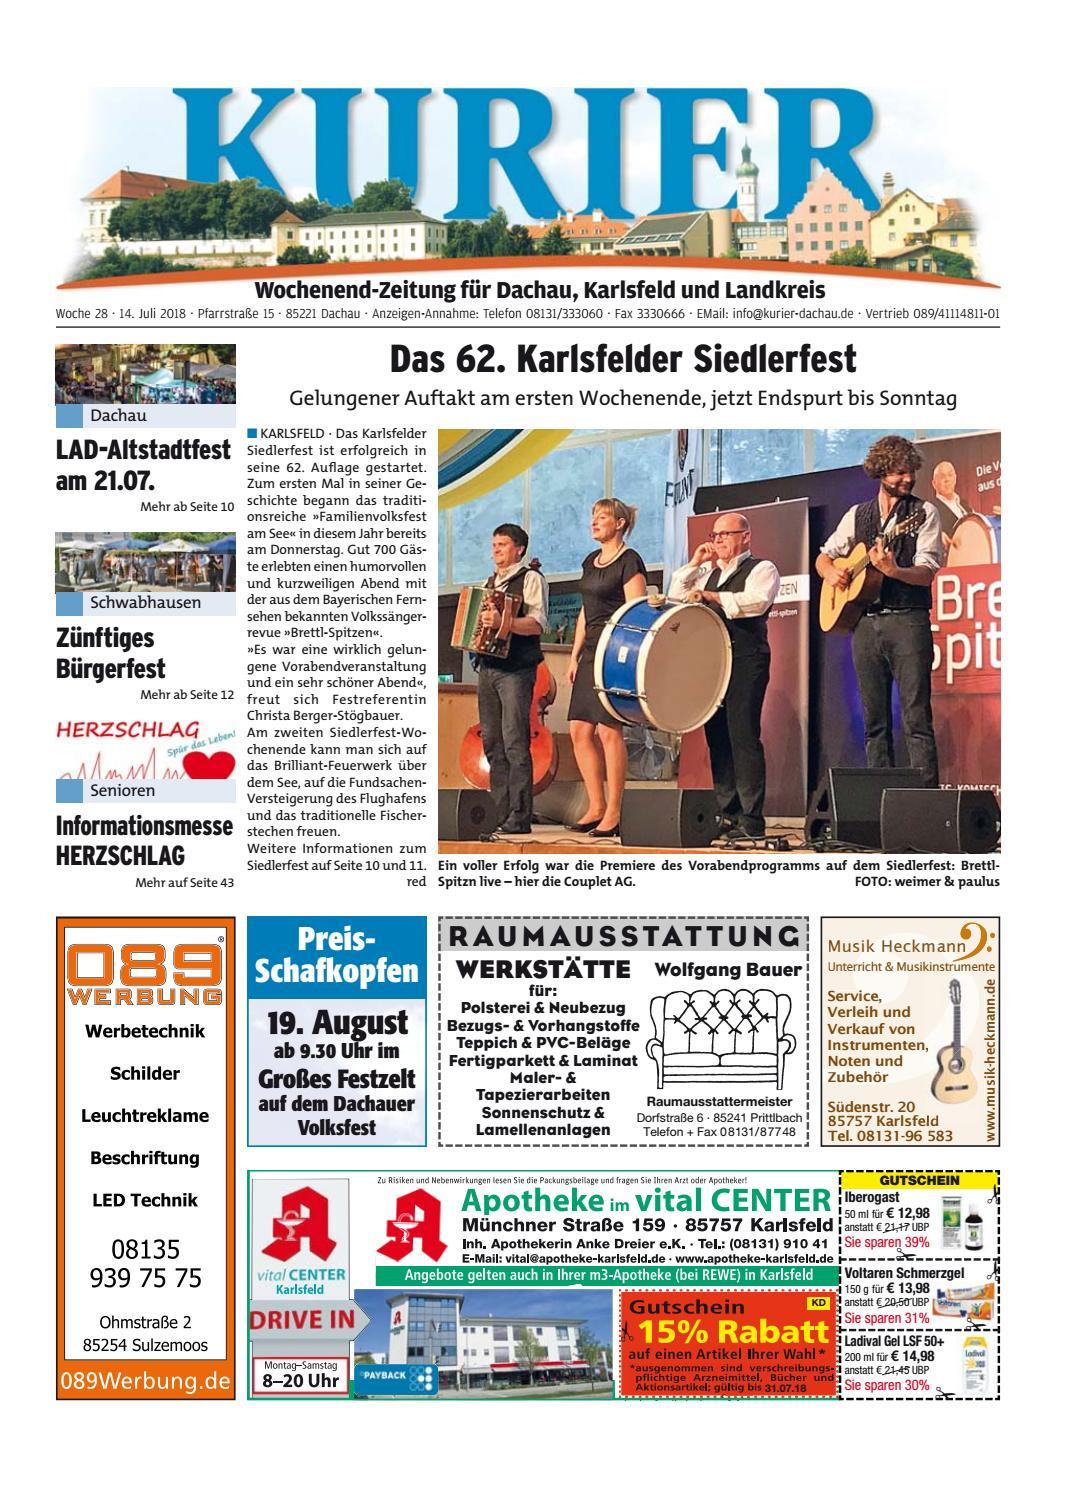 KW 28 2018 by Wochenanzeiger Me n GmbH issuu #2: page 1